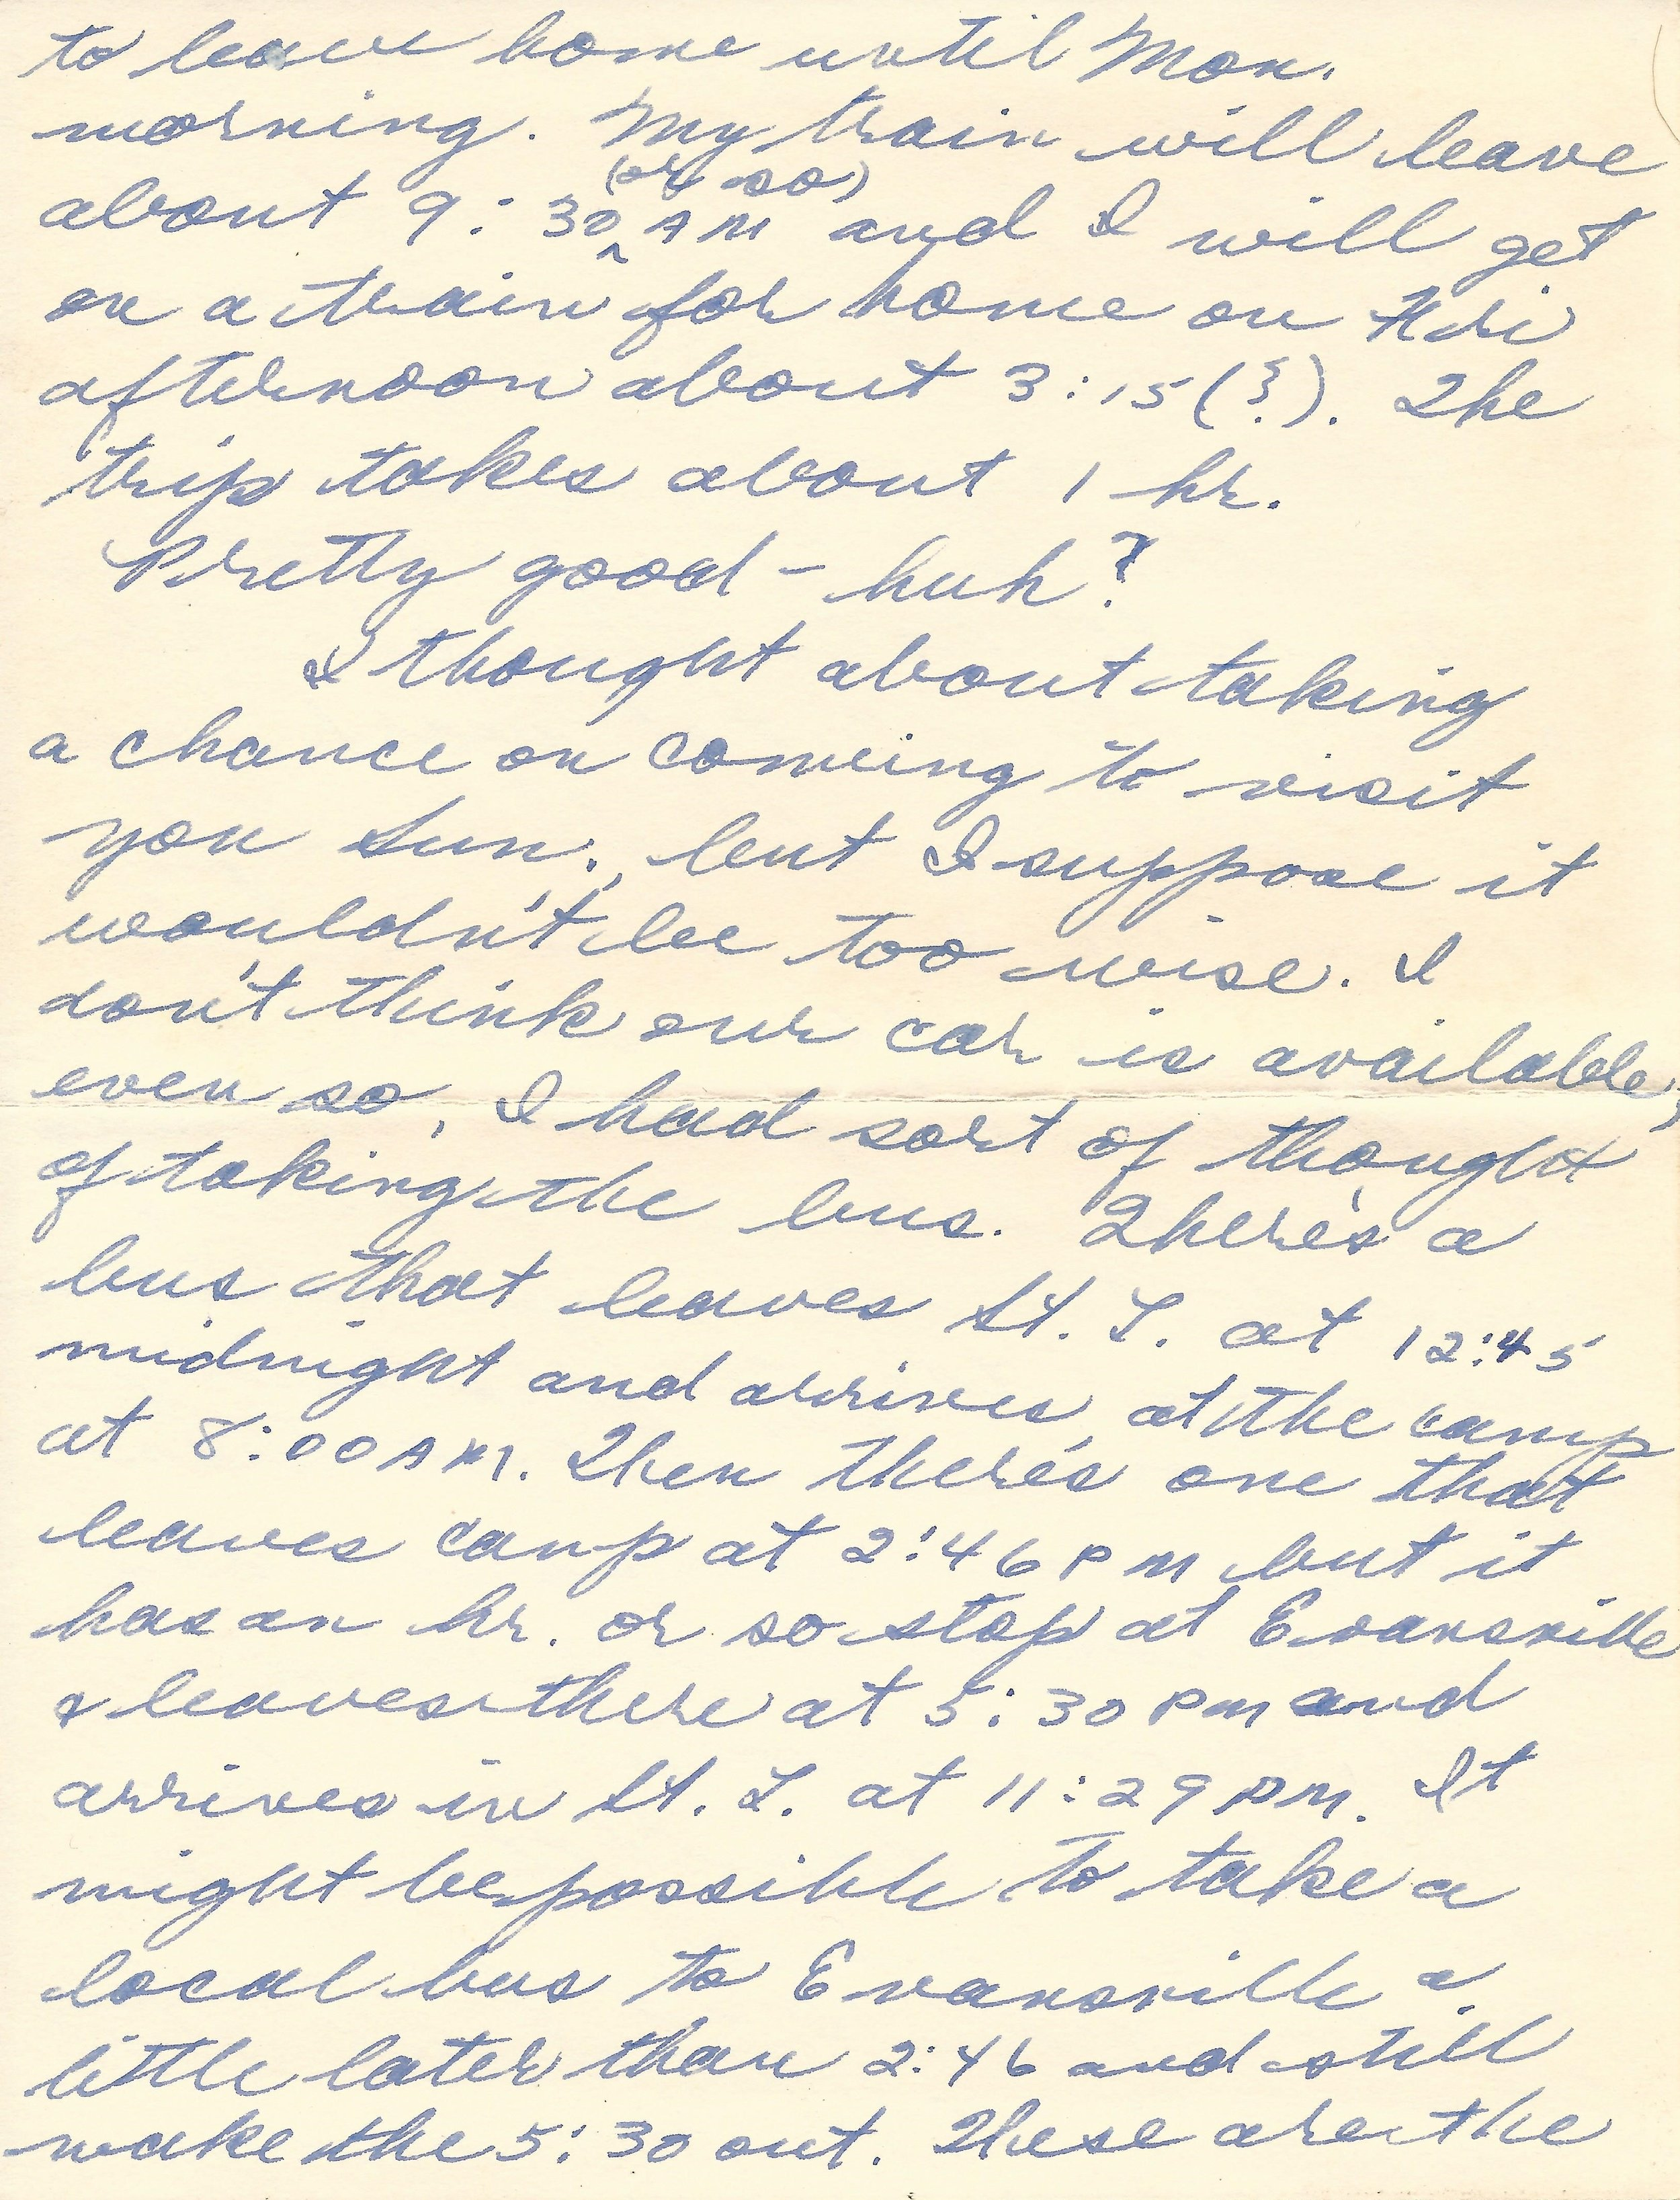 3. Nov. 4-5, 1952 (Oma)_Page_5.jpg